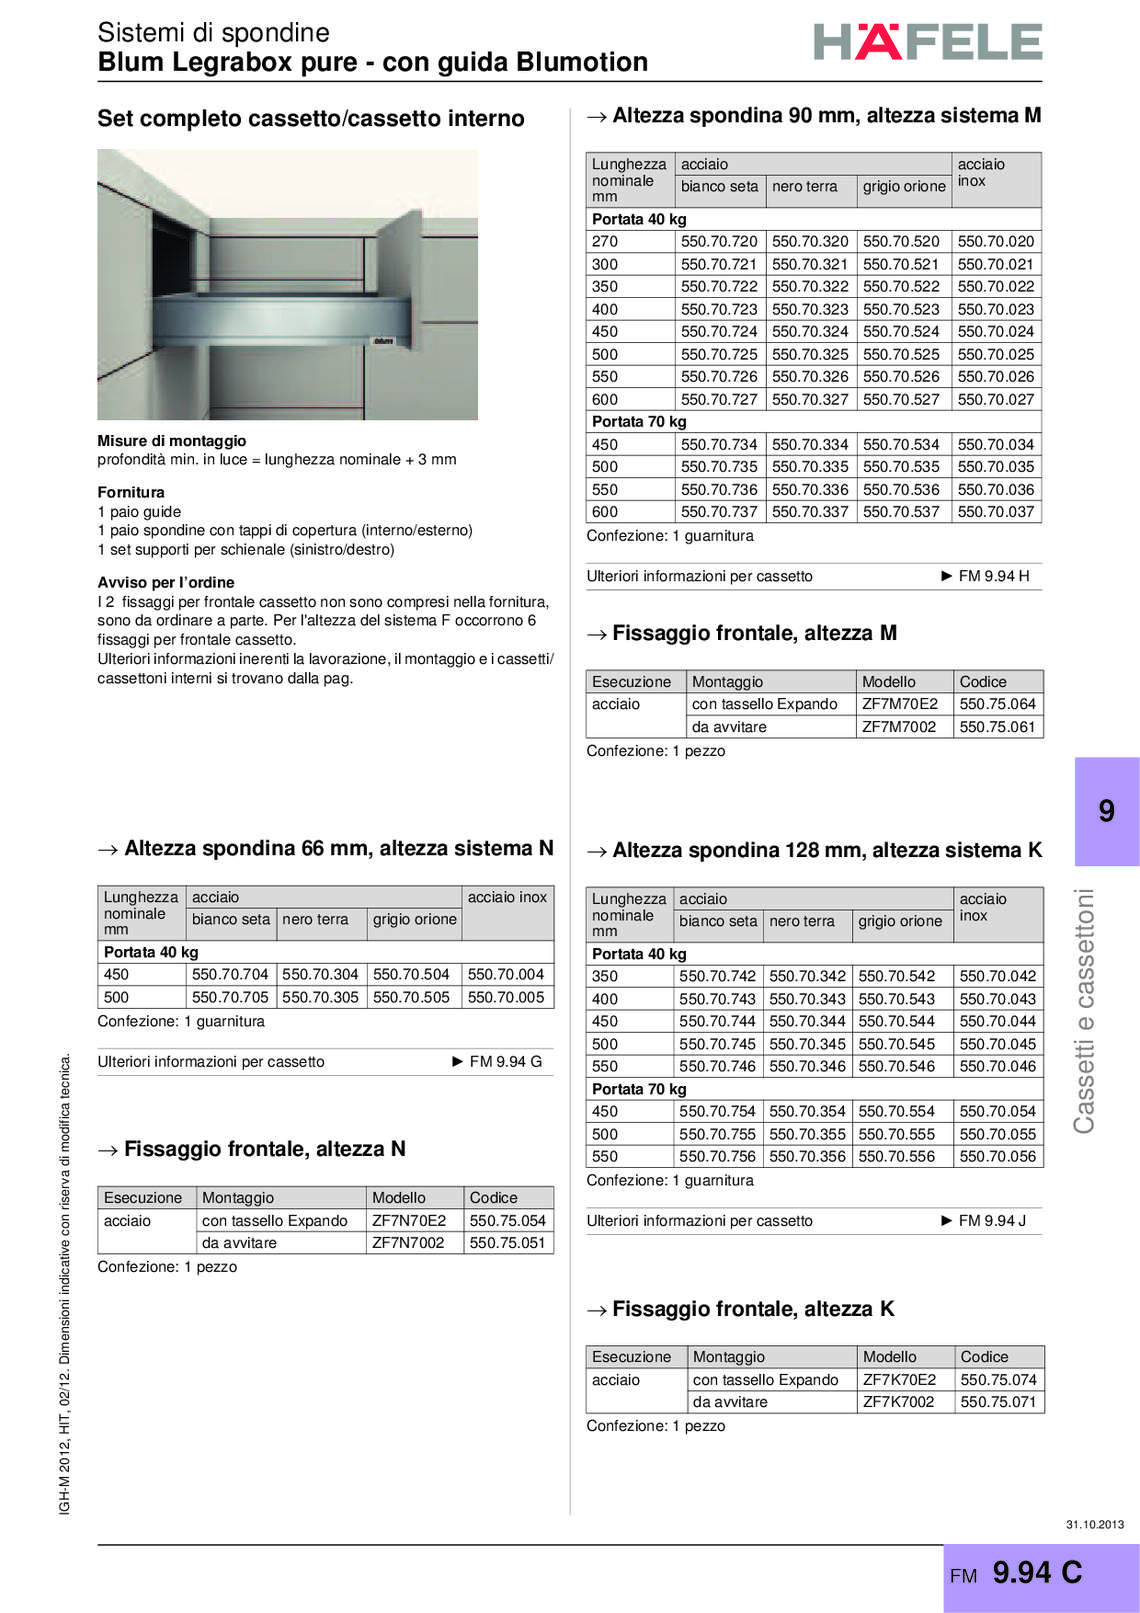 hafele-spondine-e-guide-per-mobili_40_120.jpg